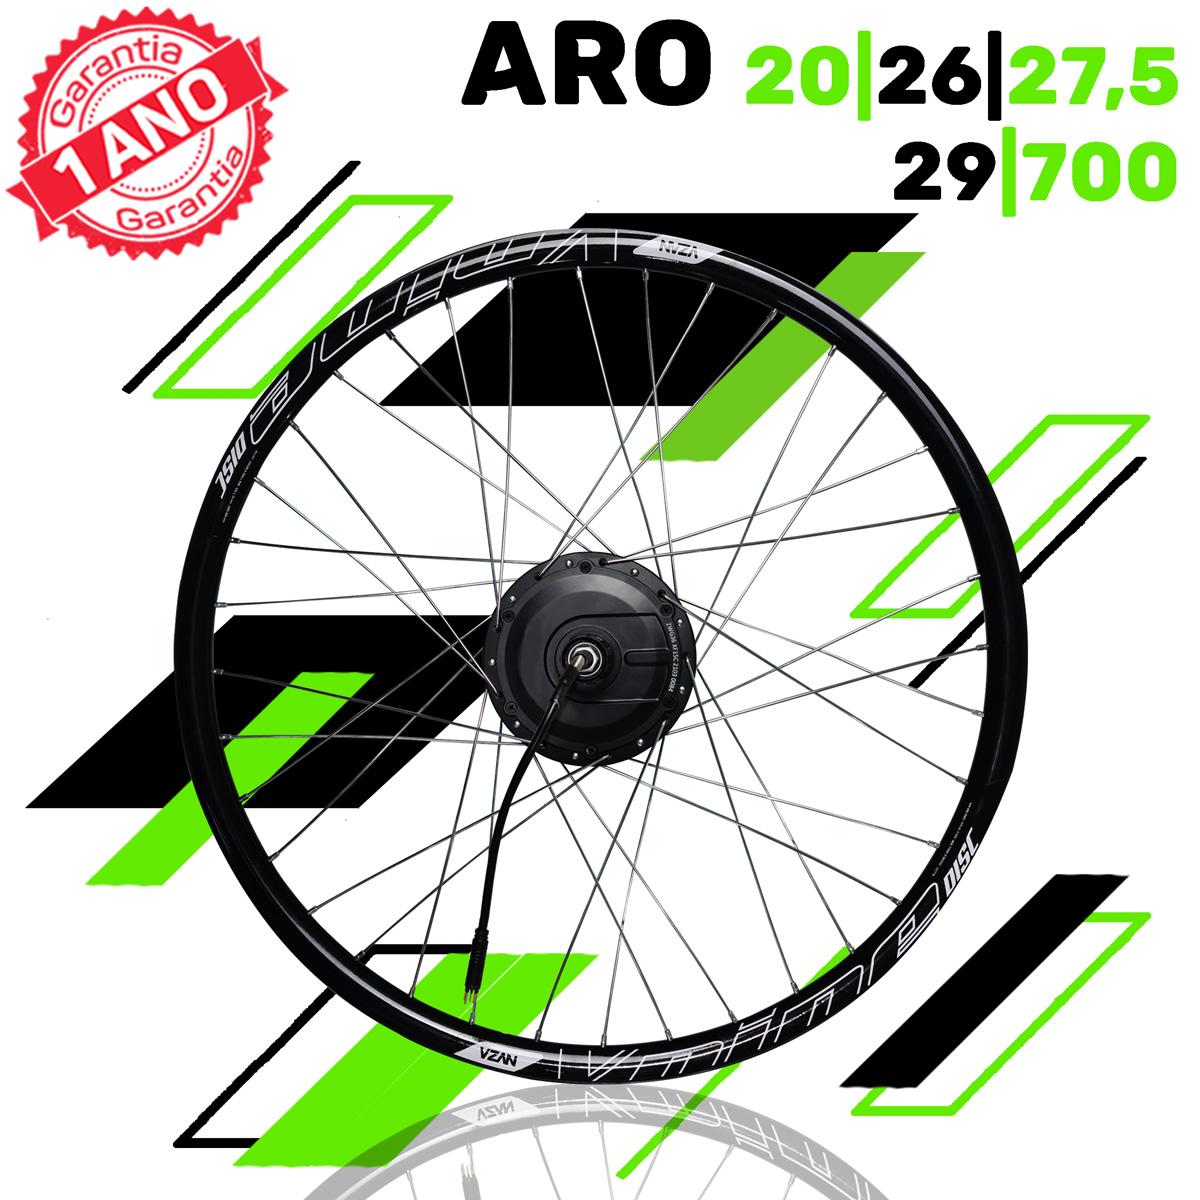 Kit Elétrico para Bicicleta - TecBike - 350 Watts 36V - Aro 26